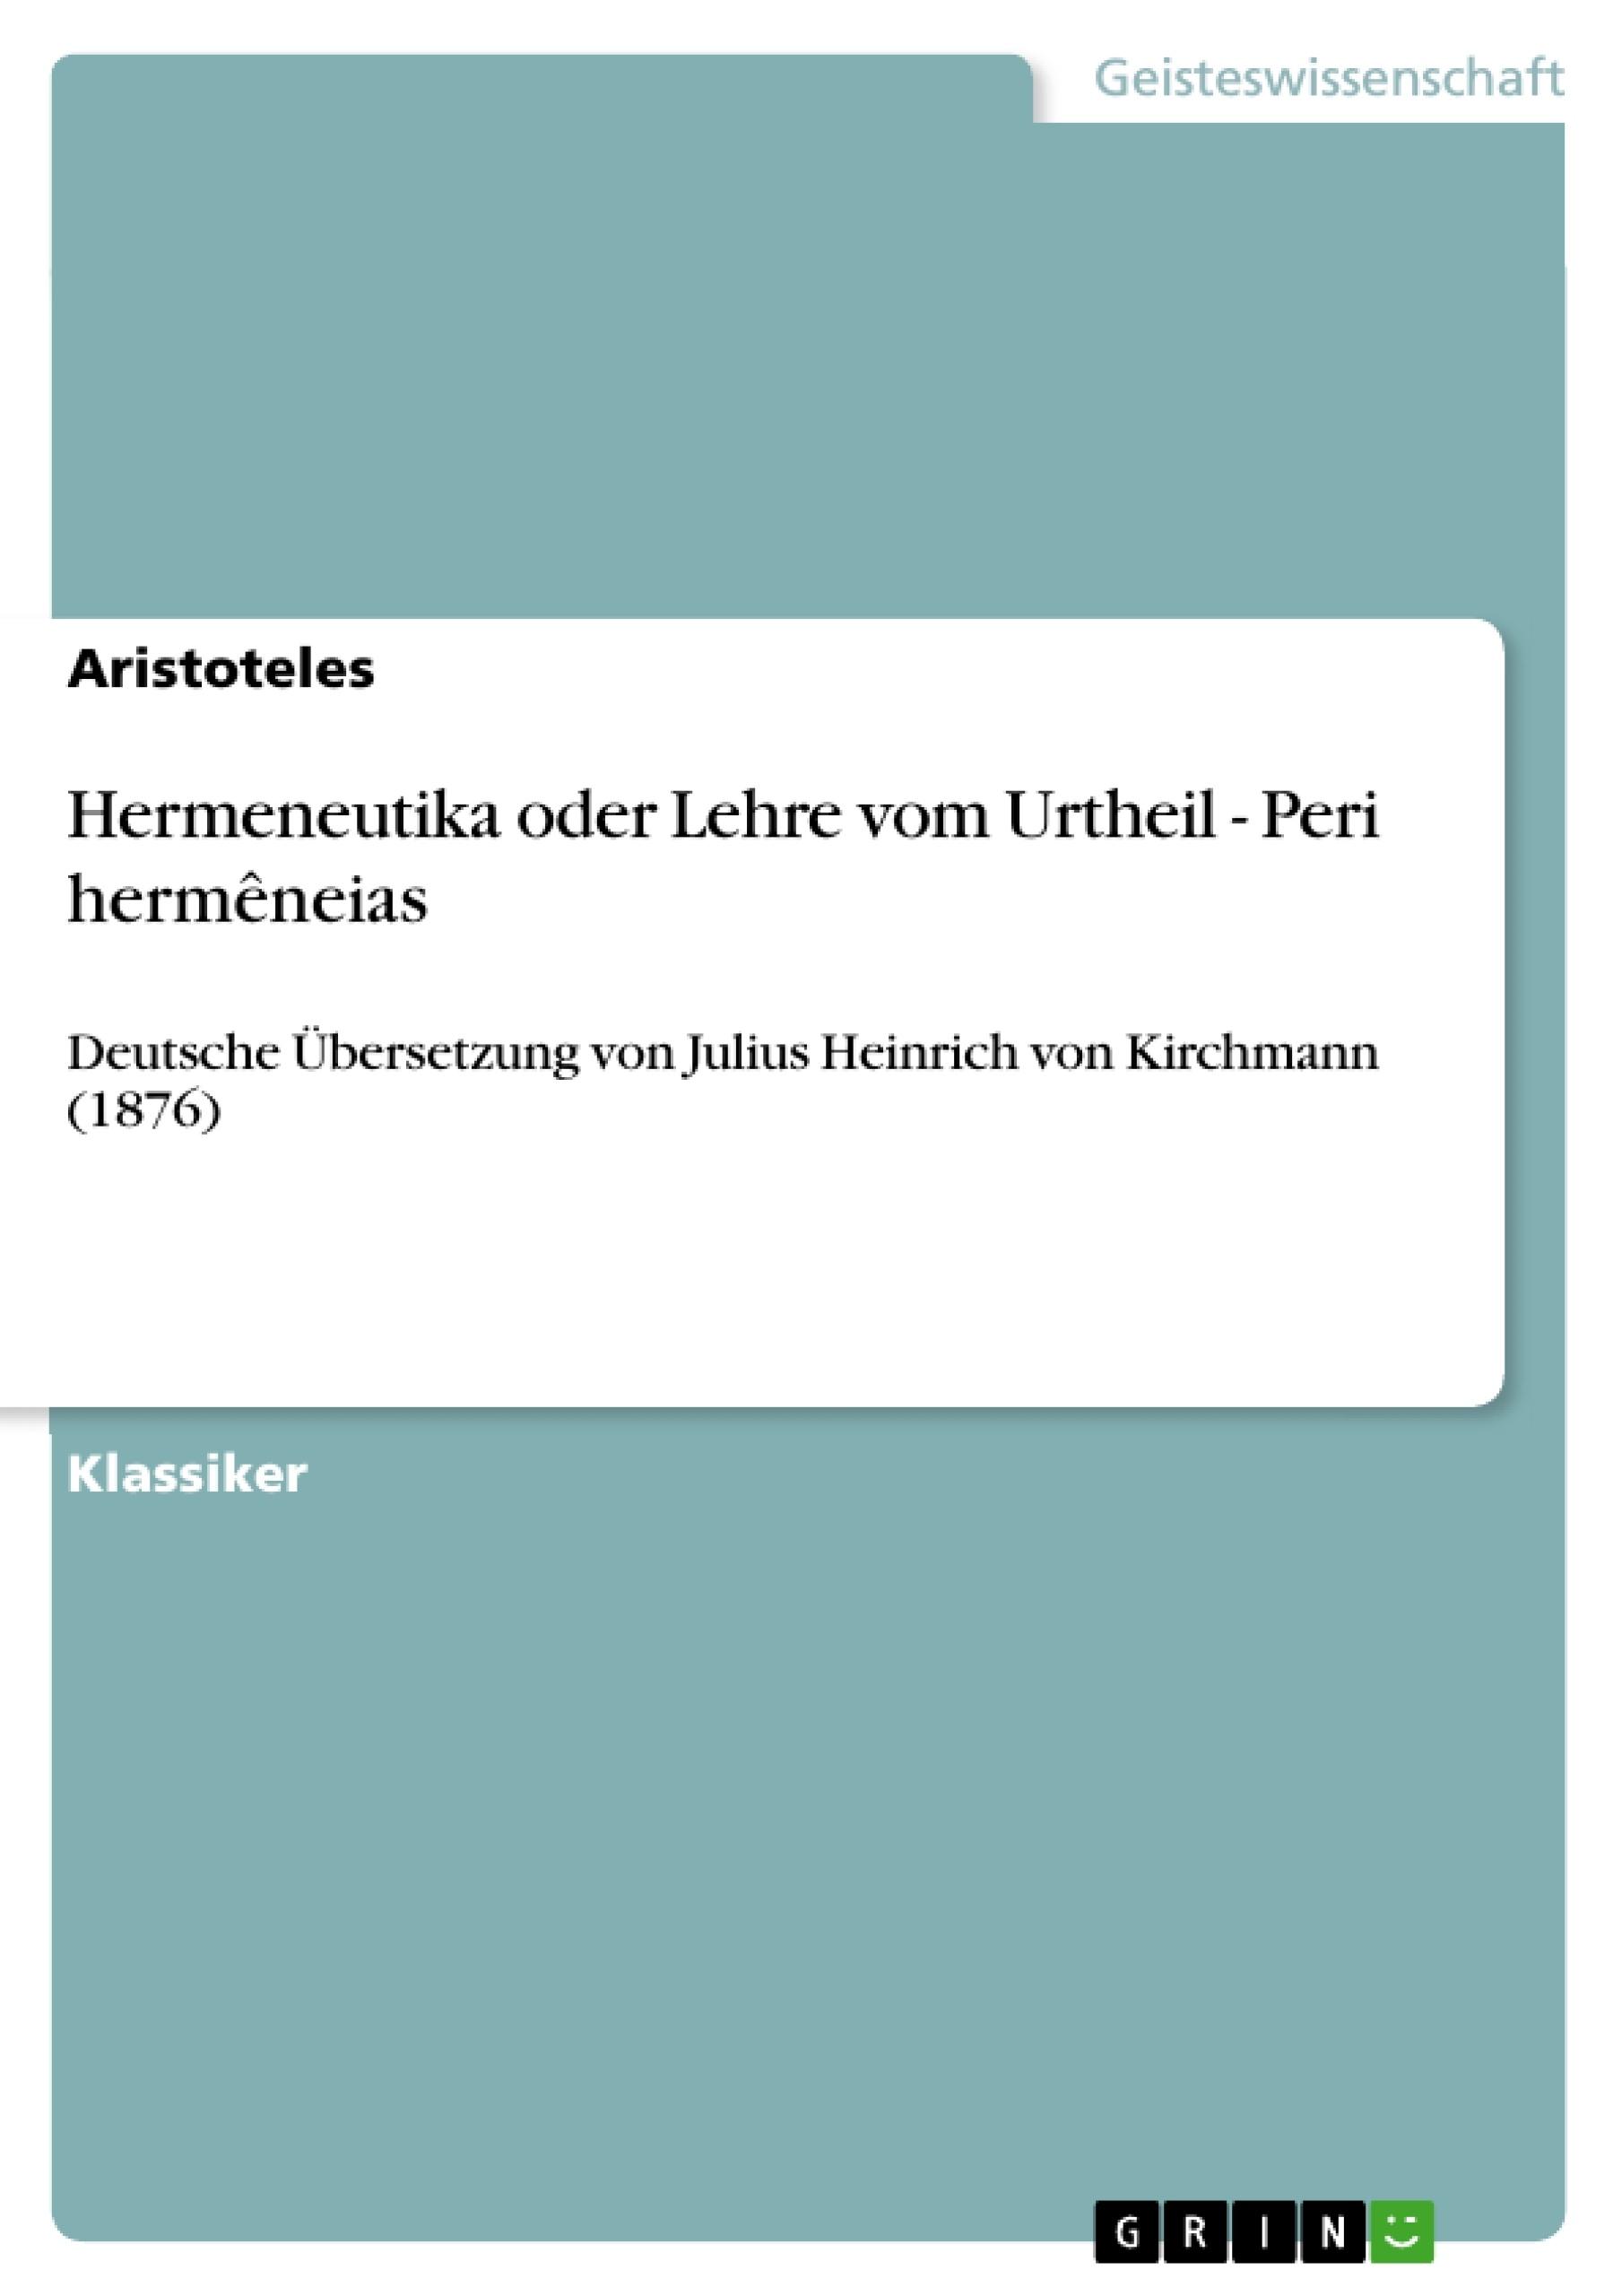 Titel: Hermeneutika oder Lehre vom Urtheil - Peri hermêneias